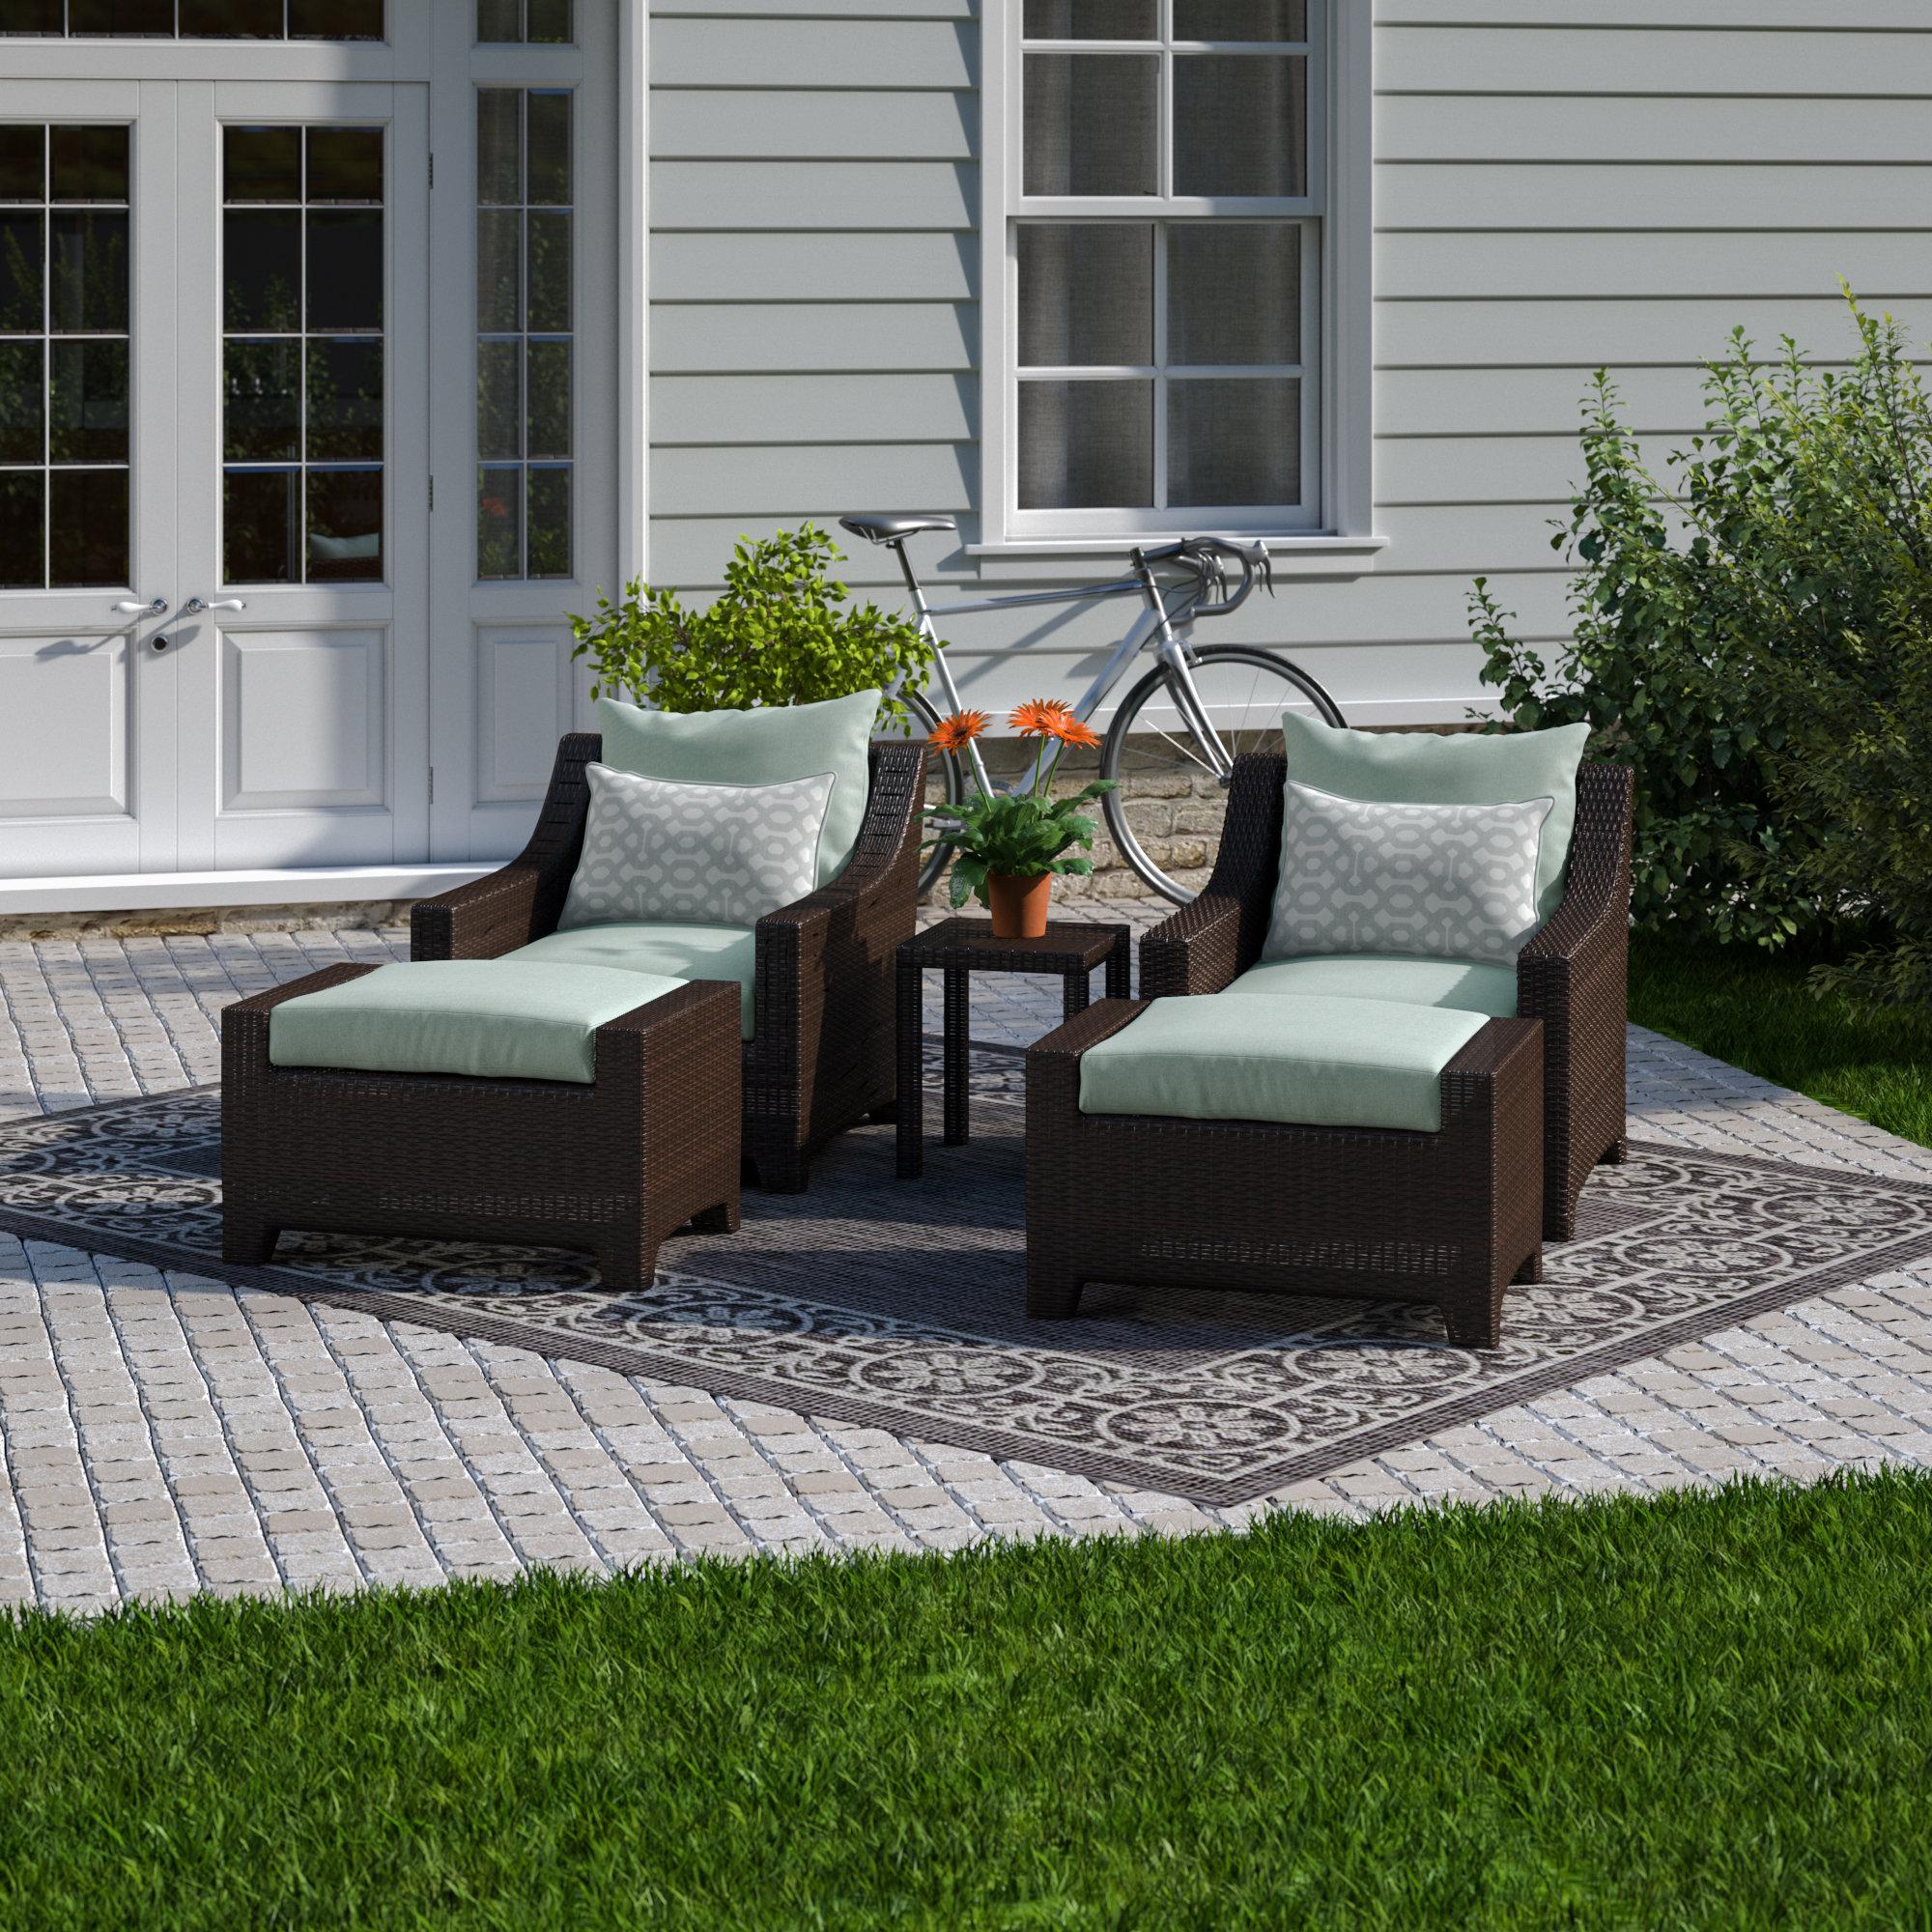 2020 Northridge 5 Piece Conversation Set With Sunbrella Cushions Regarding Northridge Patio Sofas With Sunbrella Cushions (Gallery 20 of 20)